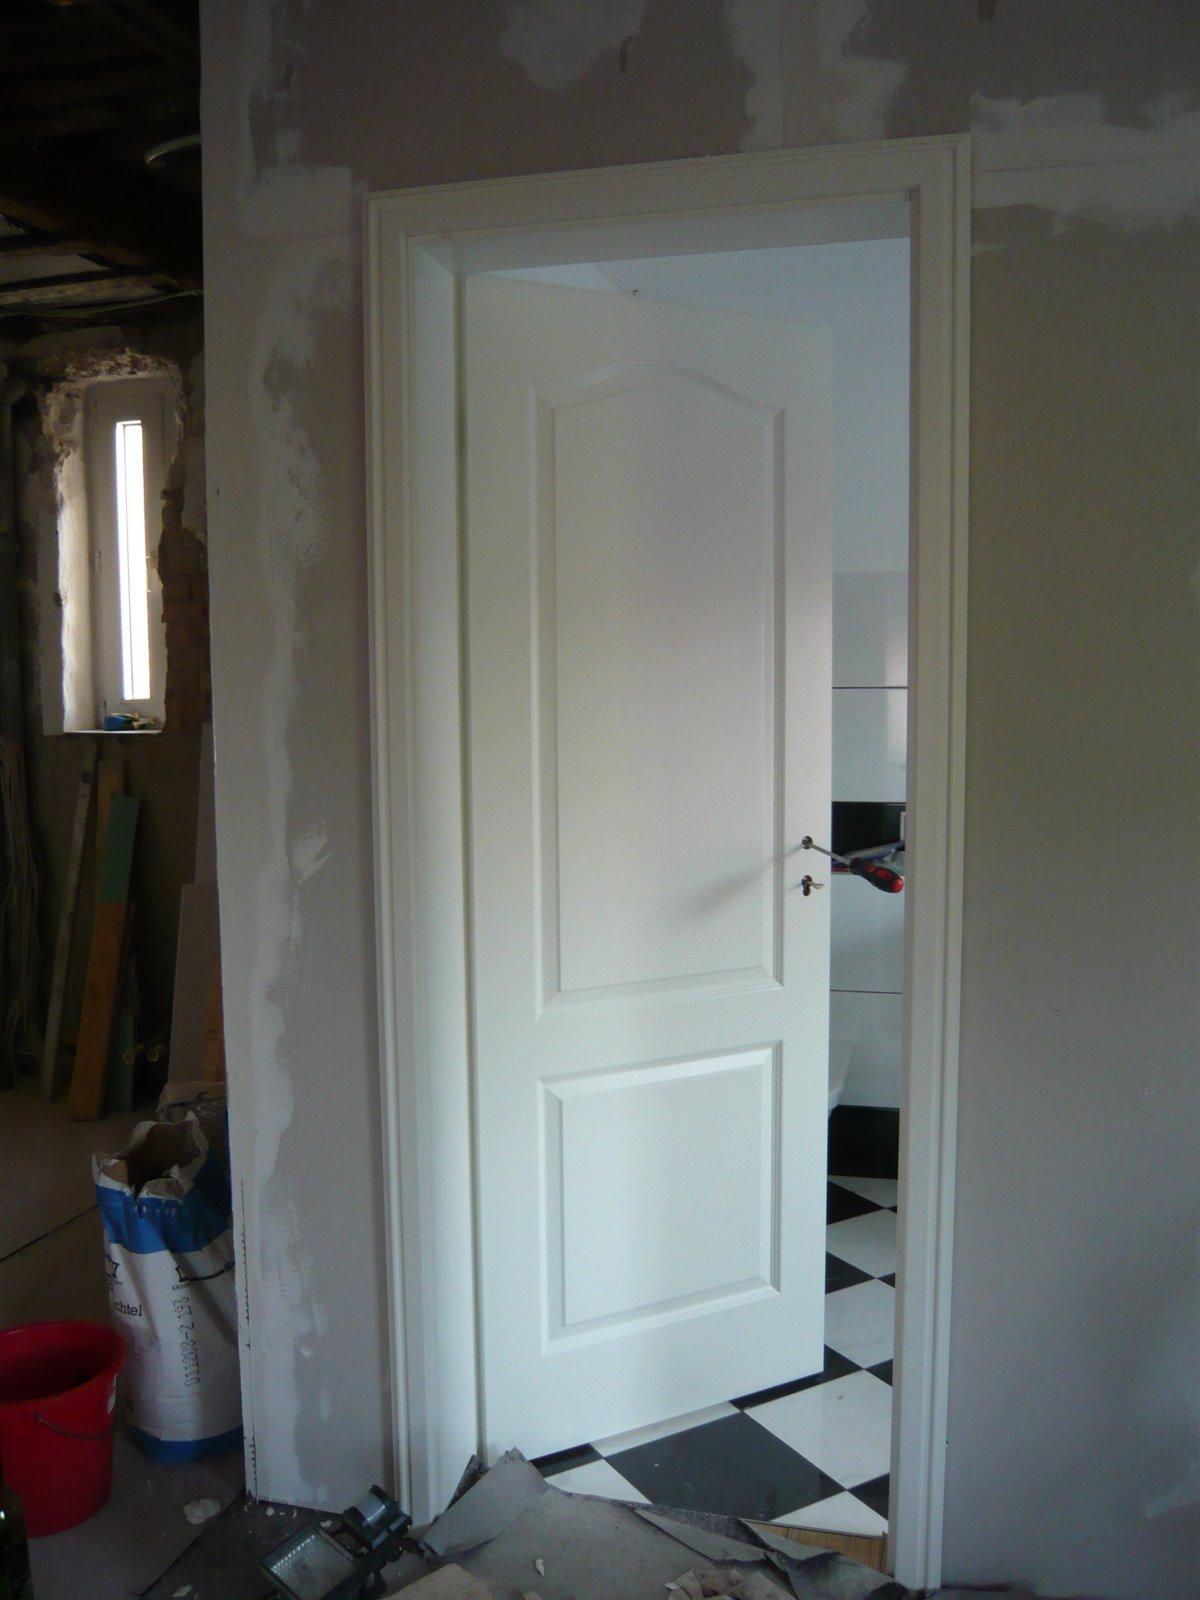 mopsis baublog badezimmert r eingesetzt. Black Bedroom Furniture Sets. Home Design Ideas